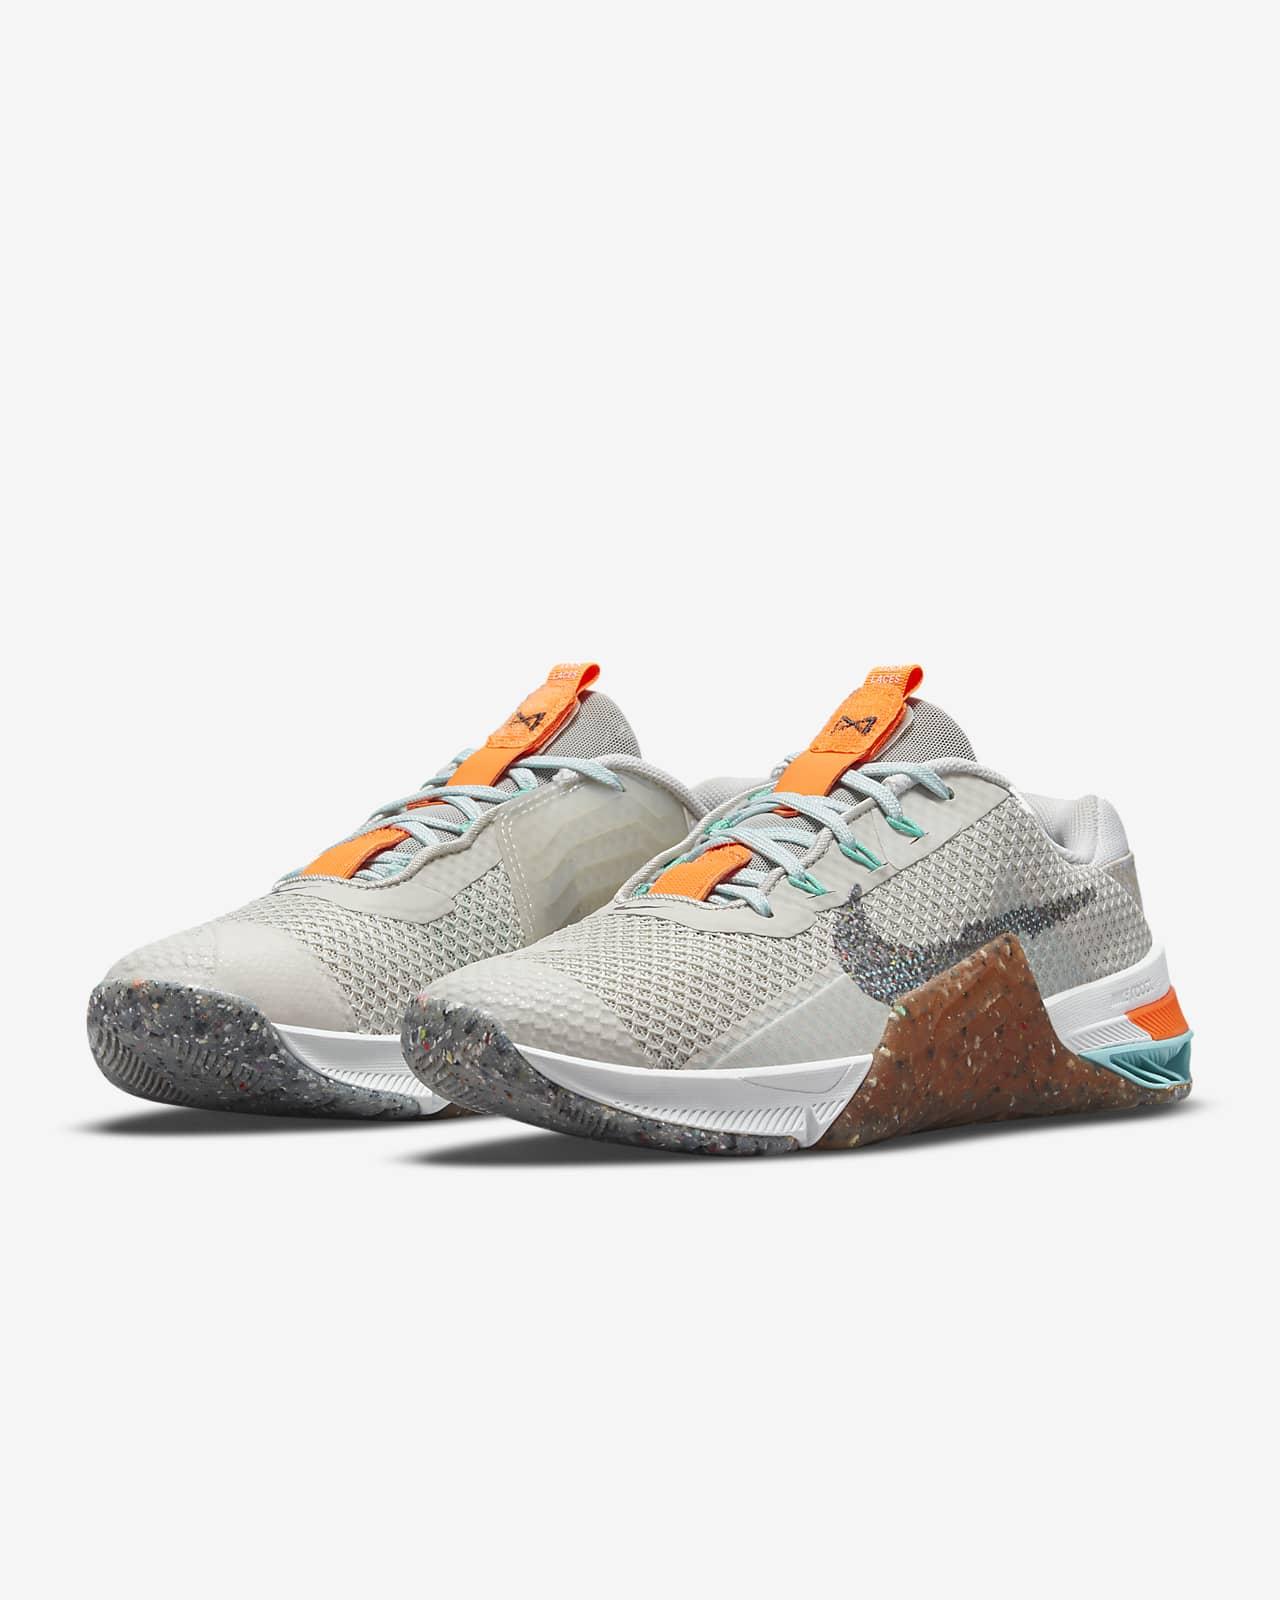 Chaussure de training Nike Metcon 7 pour Femme. Nike LU